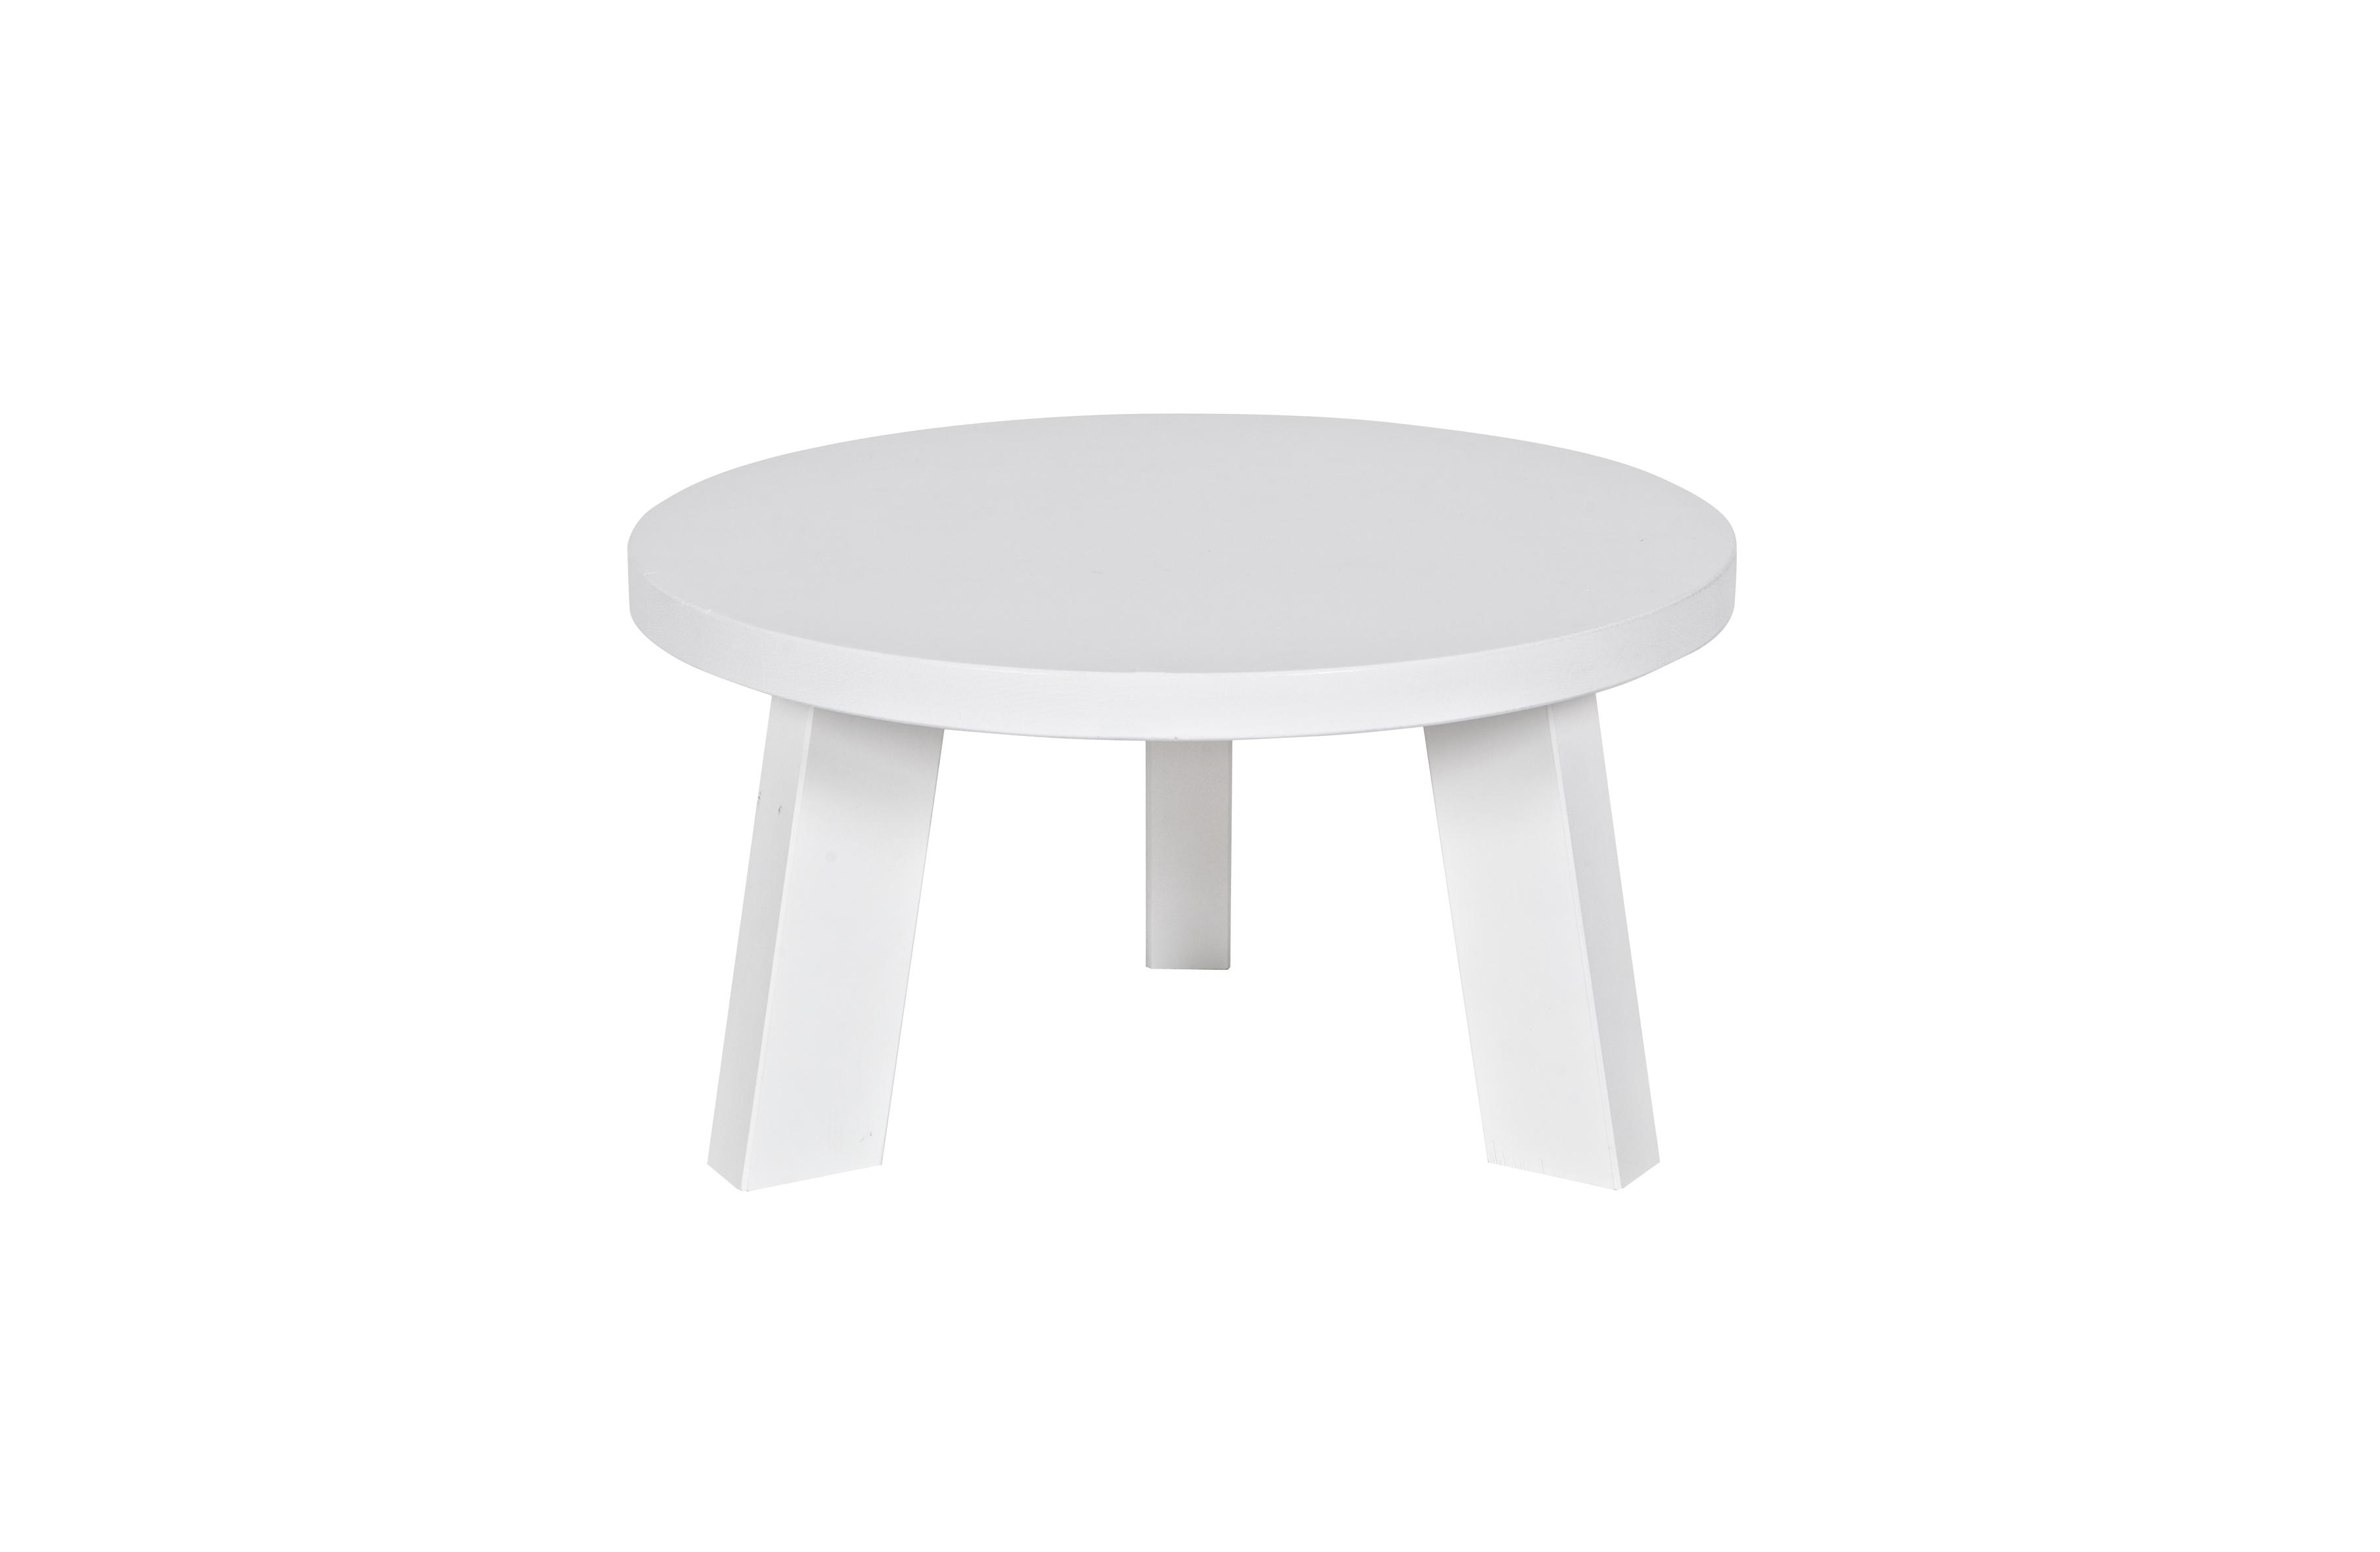 Ronde tafel ikea latest ikea ronde tafel de table lack ikea tafel